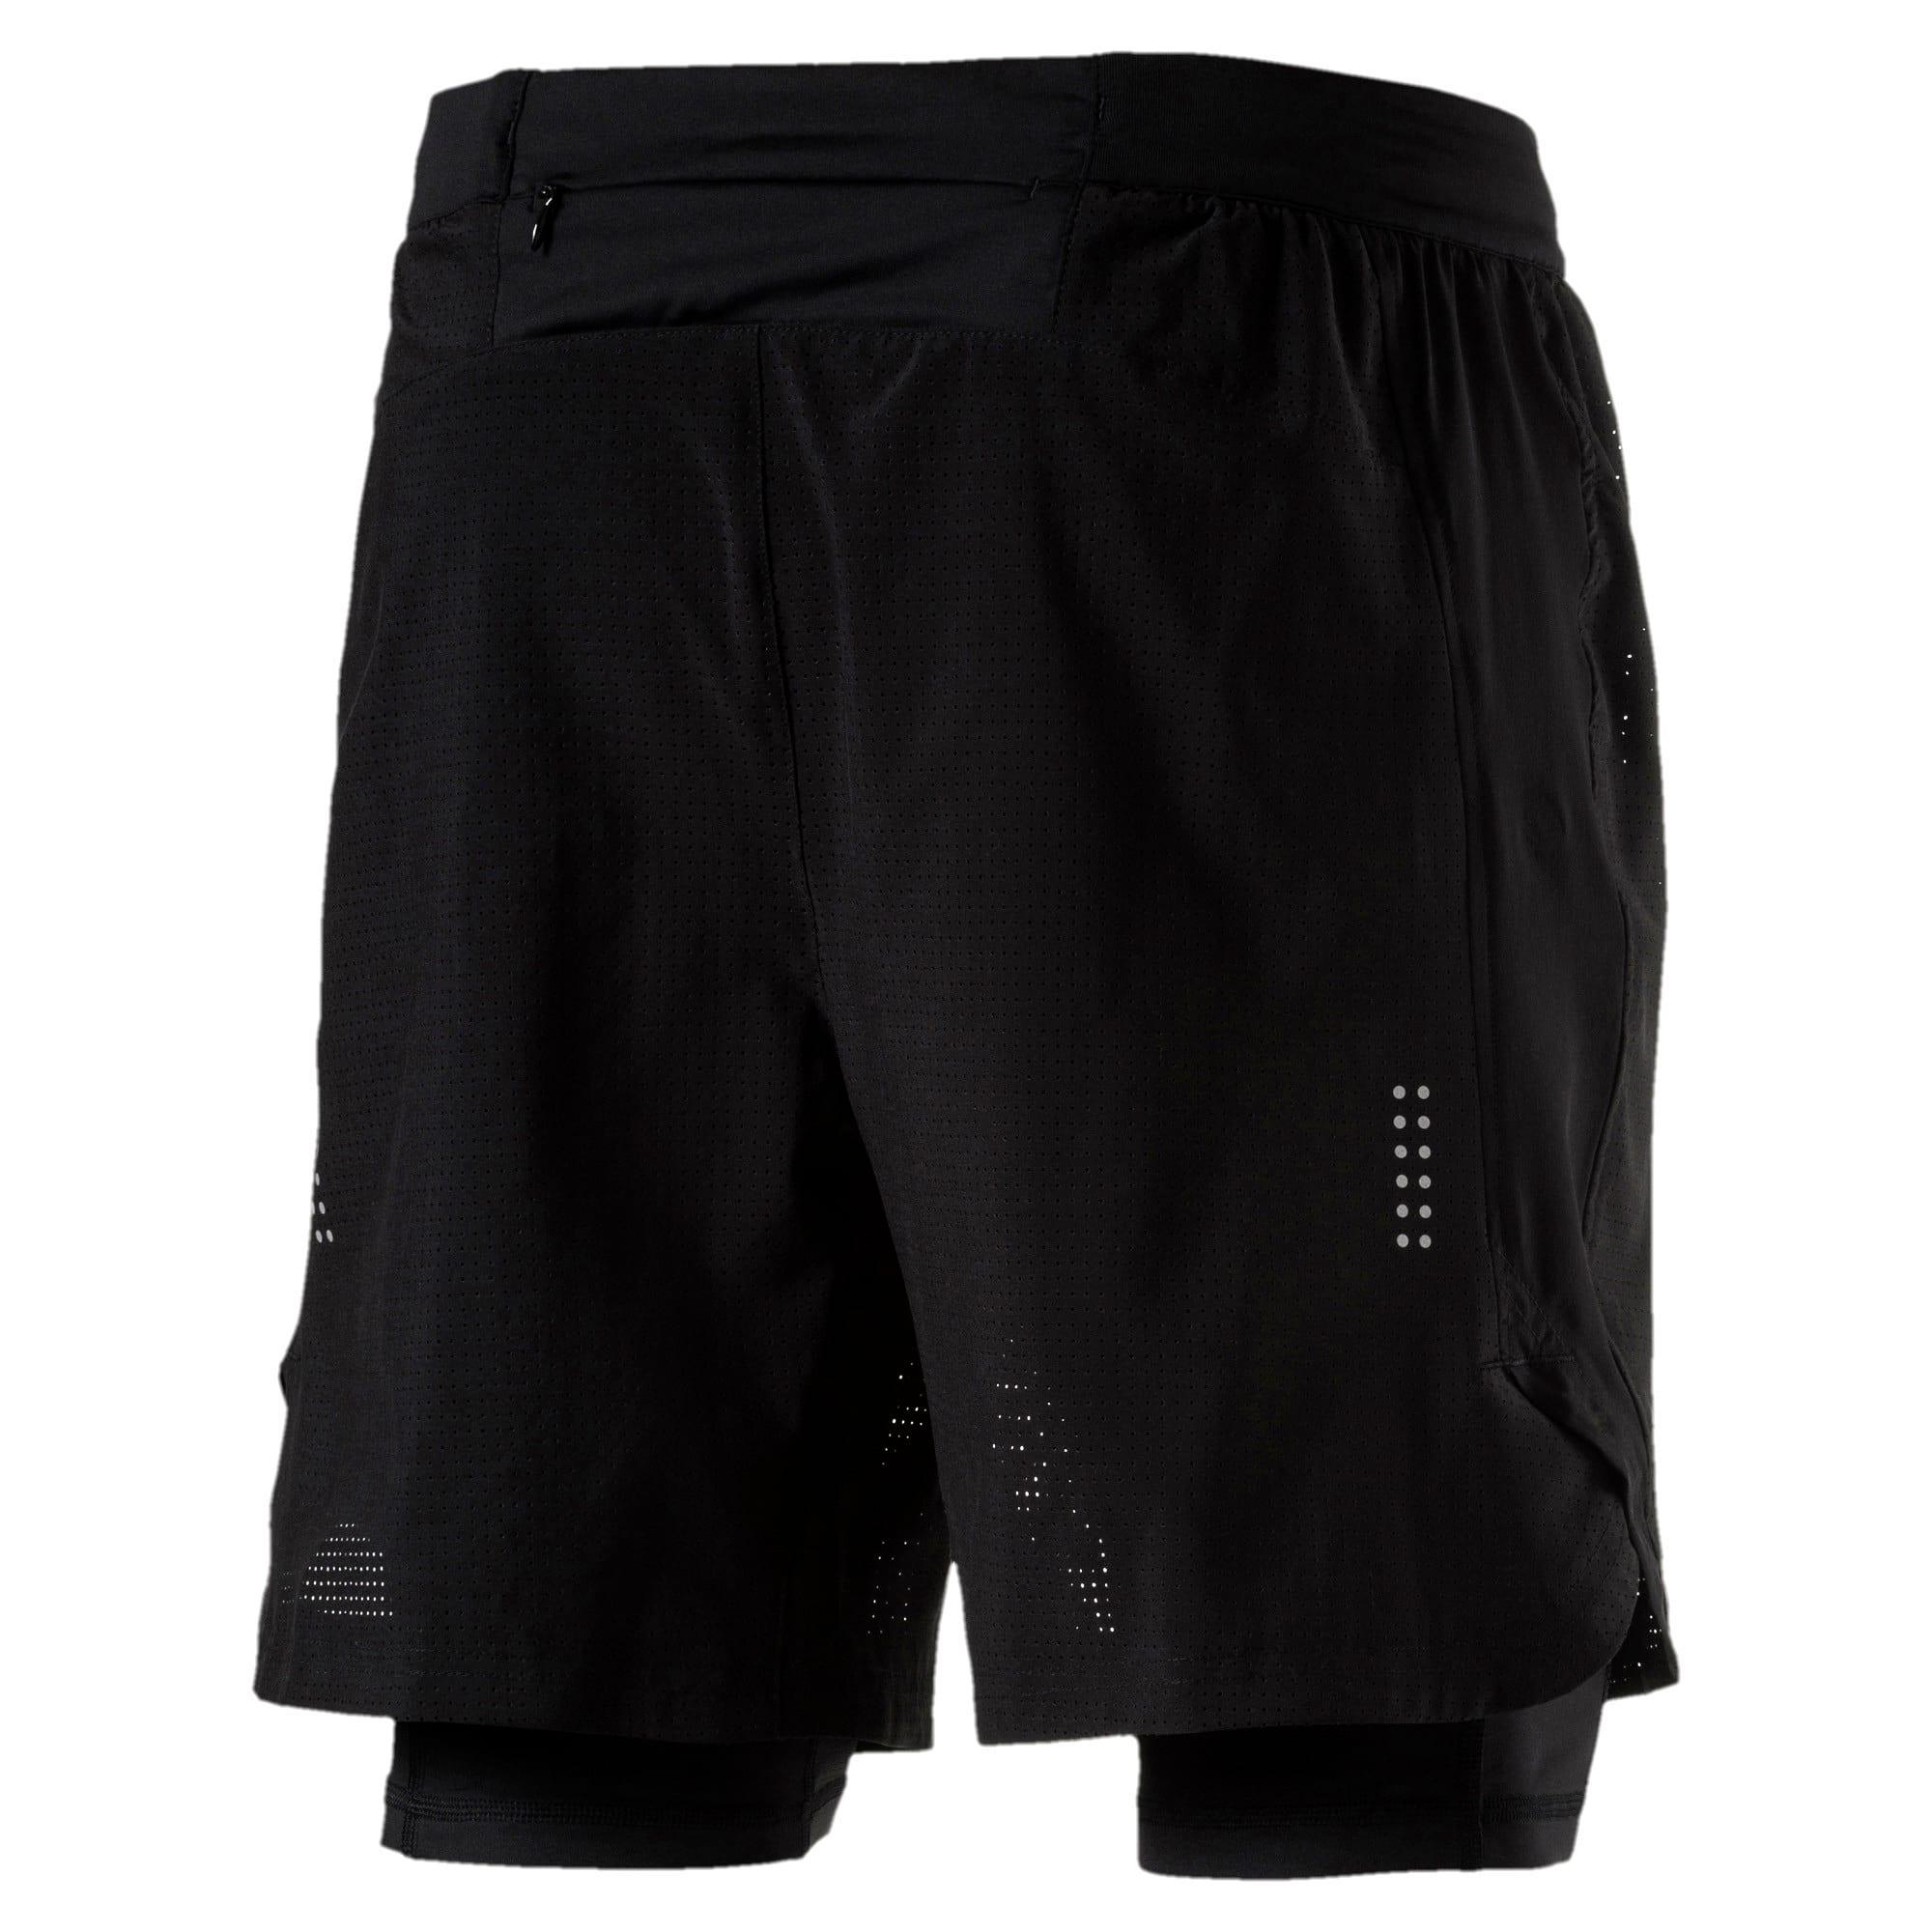 Thumbnail 5 of Running Men's Pace 2 in 1 Shorts, Puma Black, medium-IND